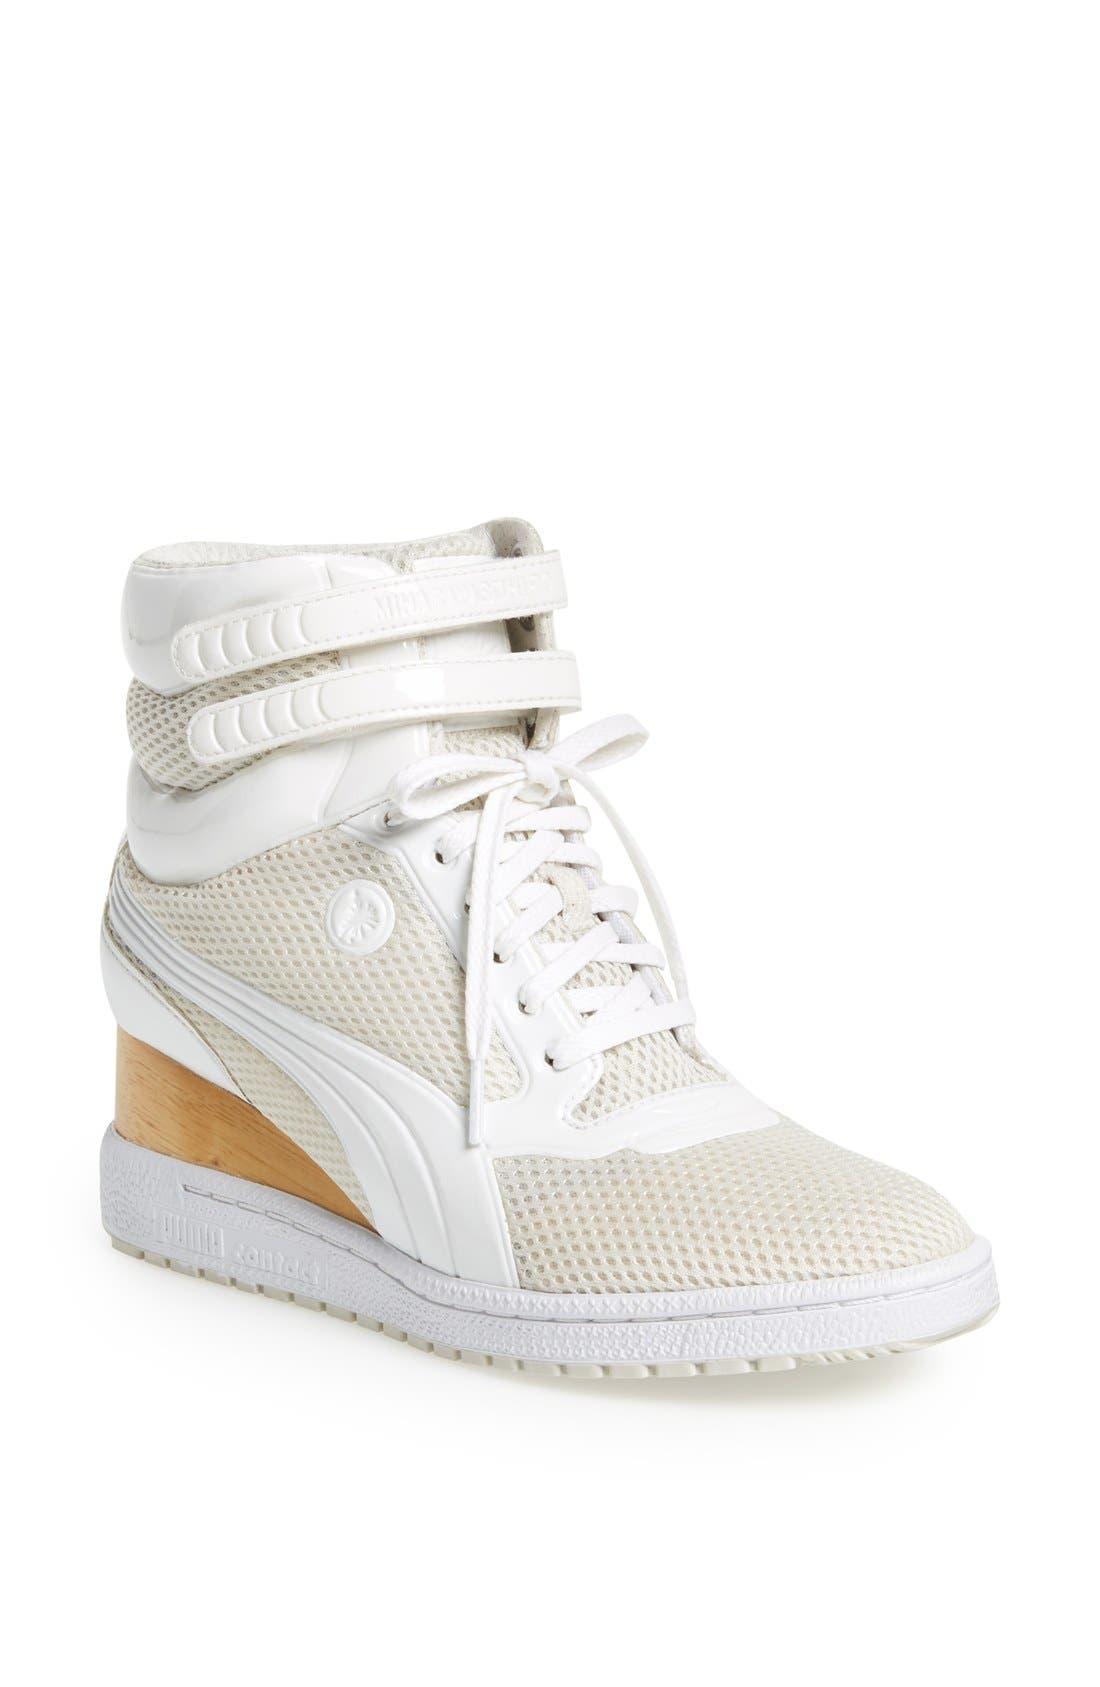 Alternate Image 1 Selected - PUMA 'My 77' Sneaker (Women)